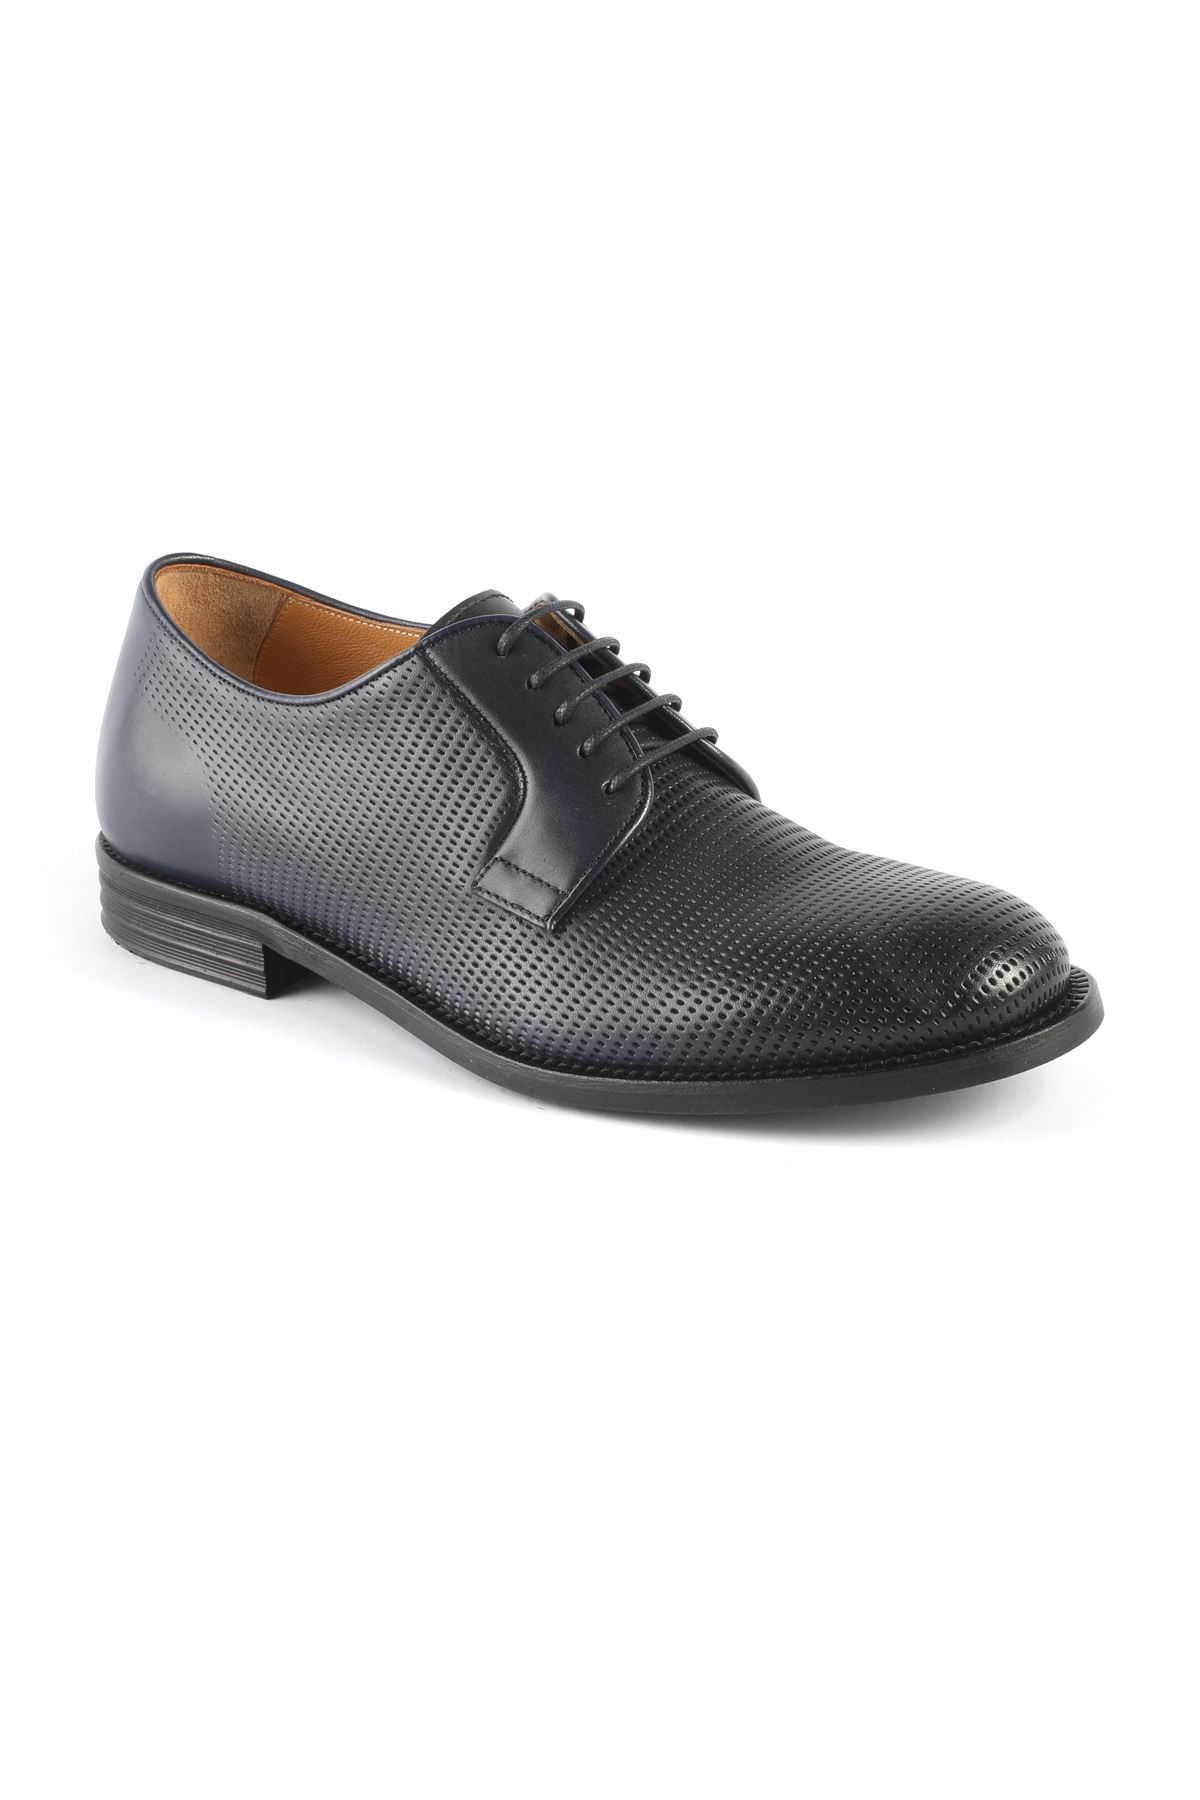 Libero L3210 Navy Blue Classic Shoes